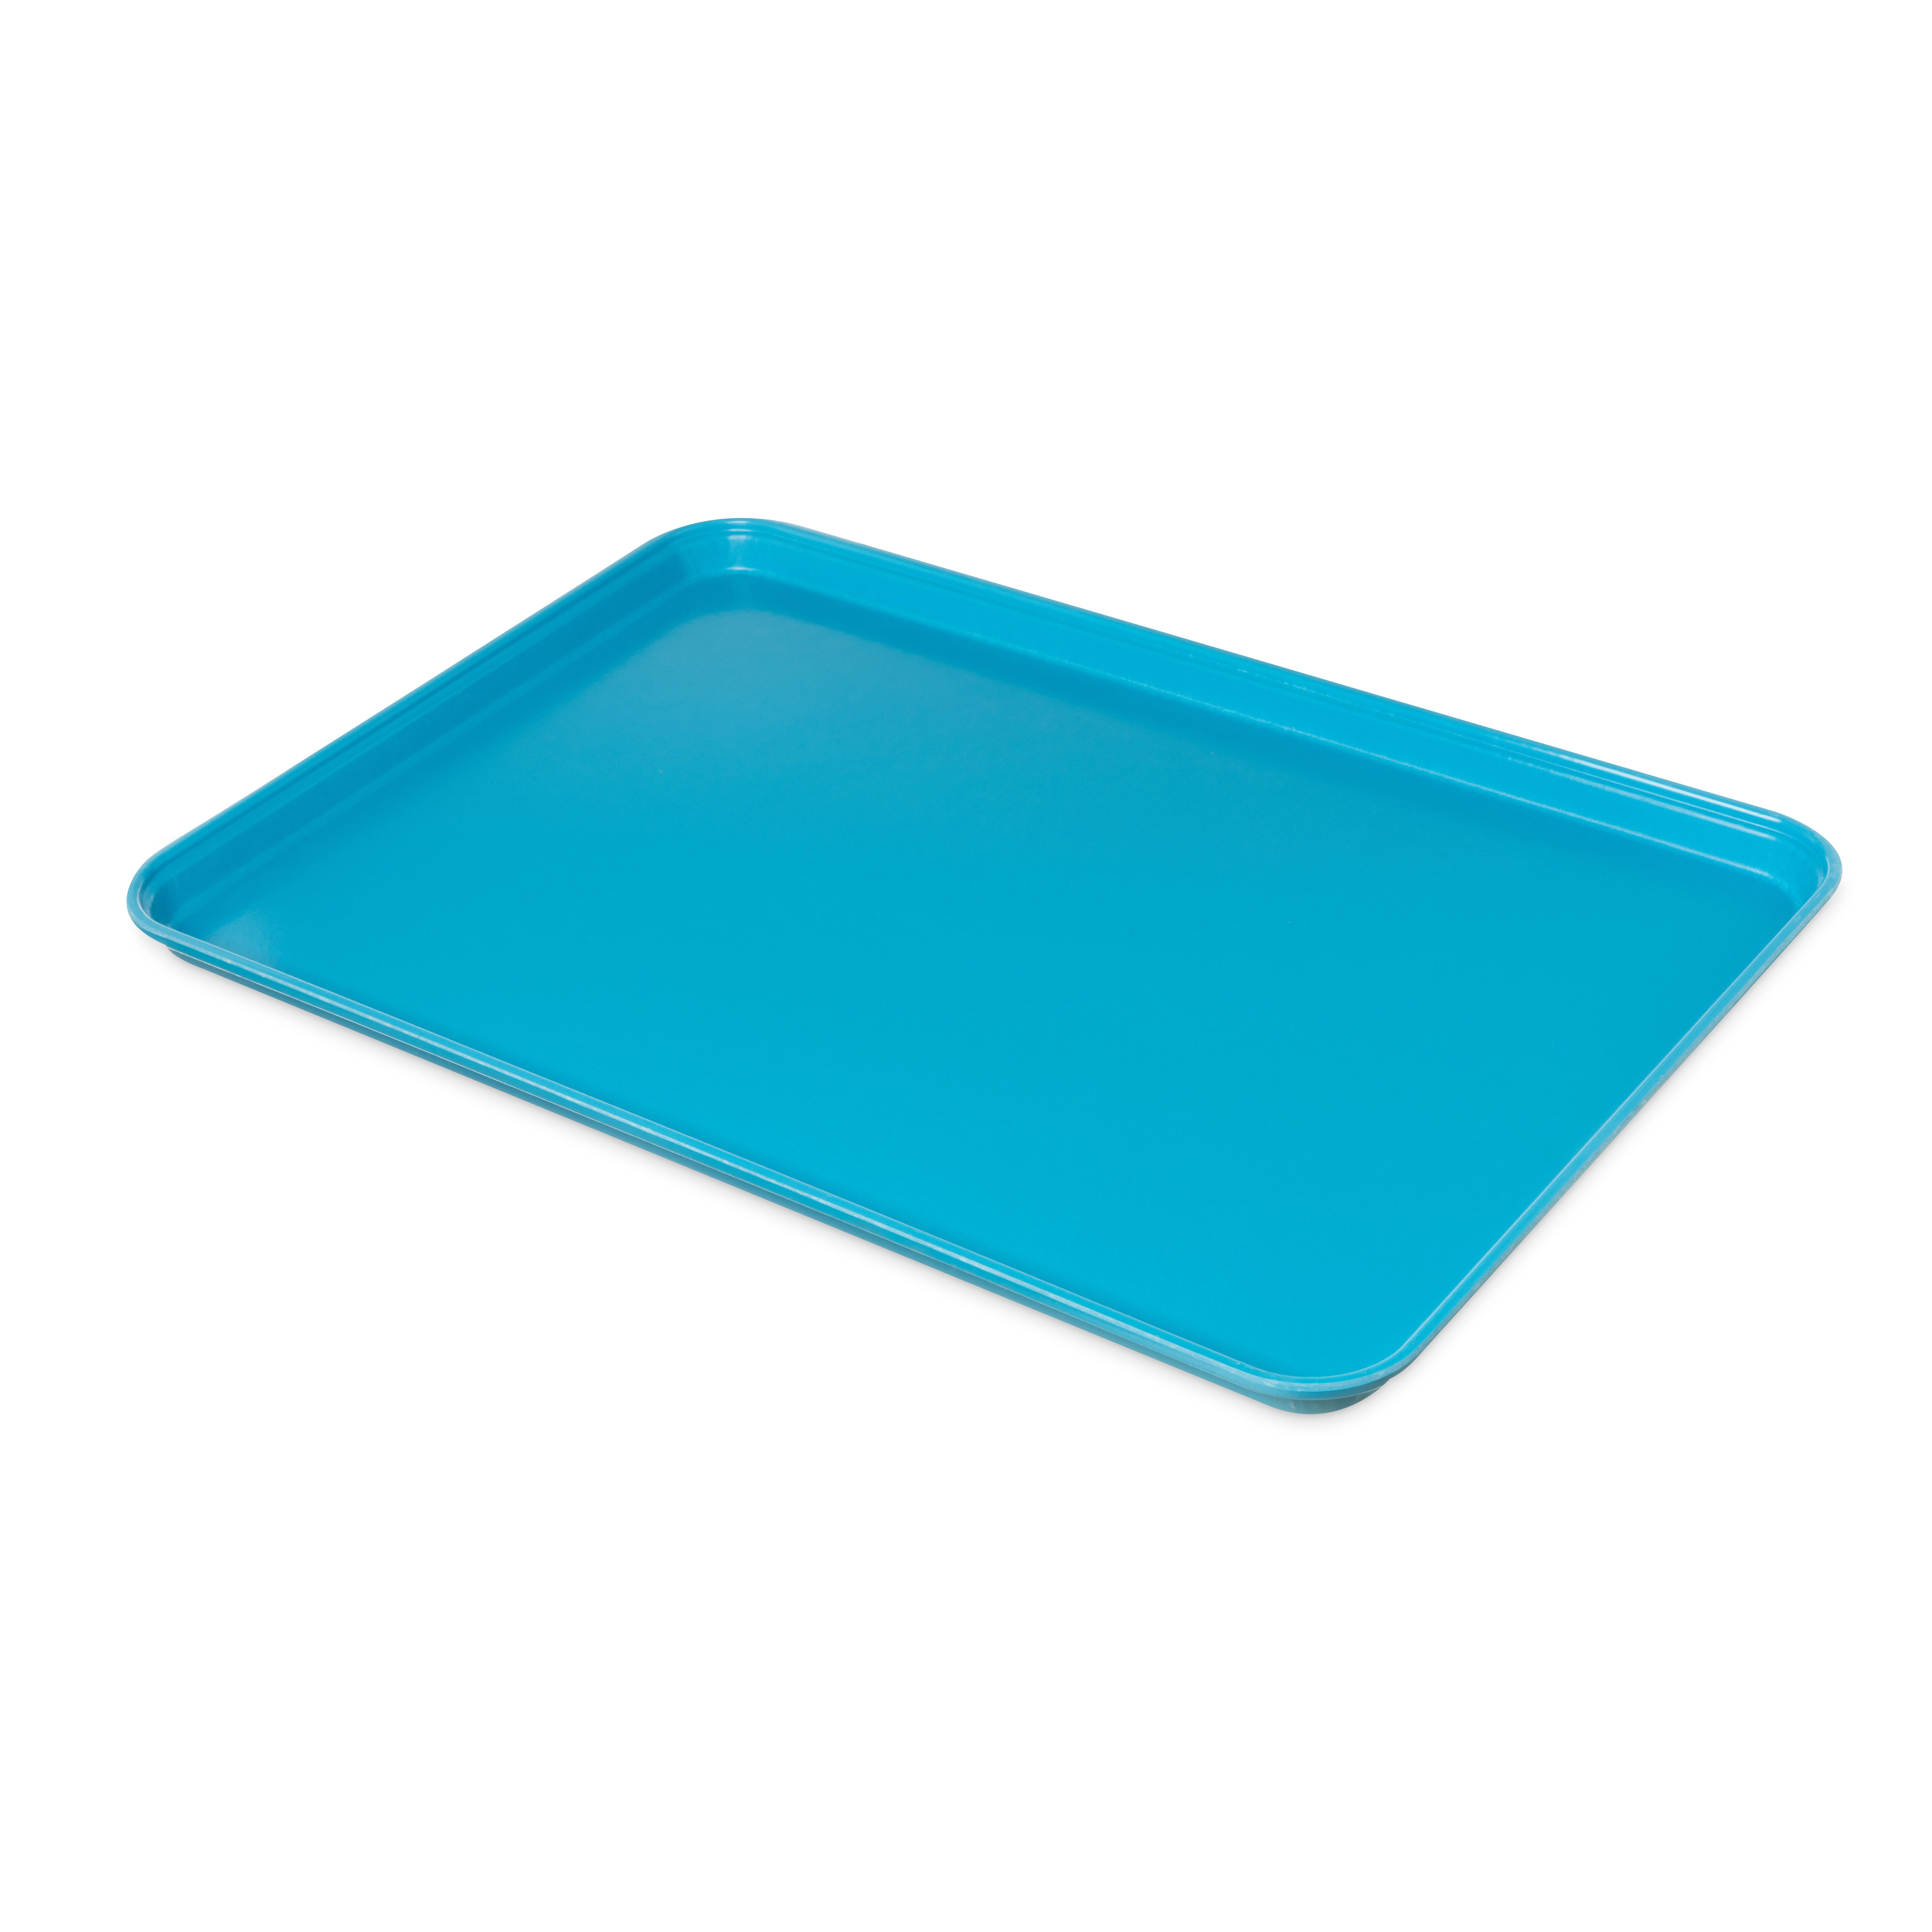 Carlisle 2618FMTQ306 display tray, market / bakery